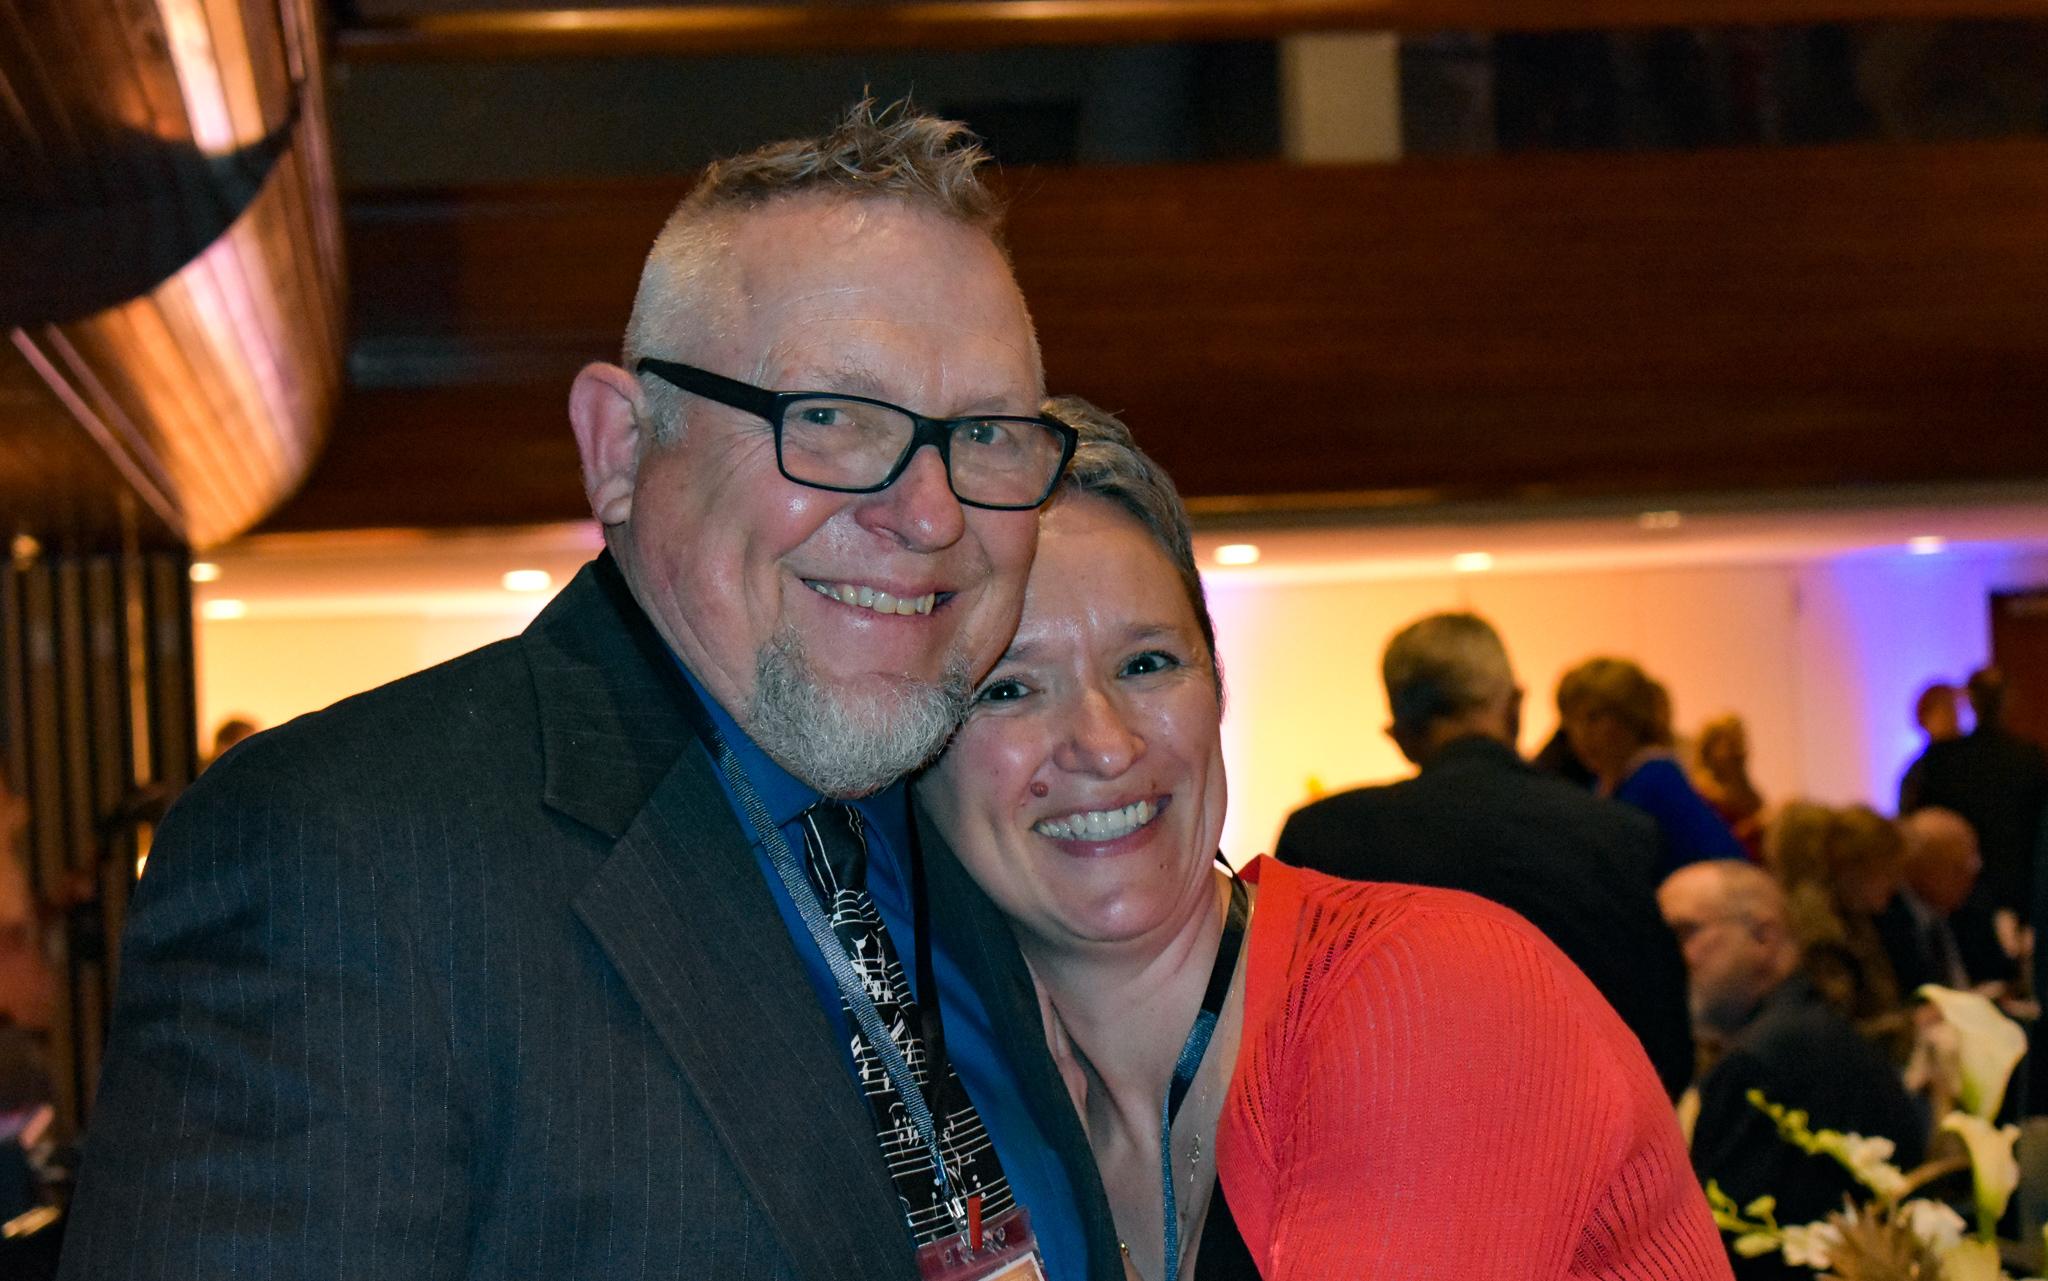 Bill Doepkens & Alison Combes